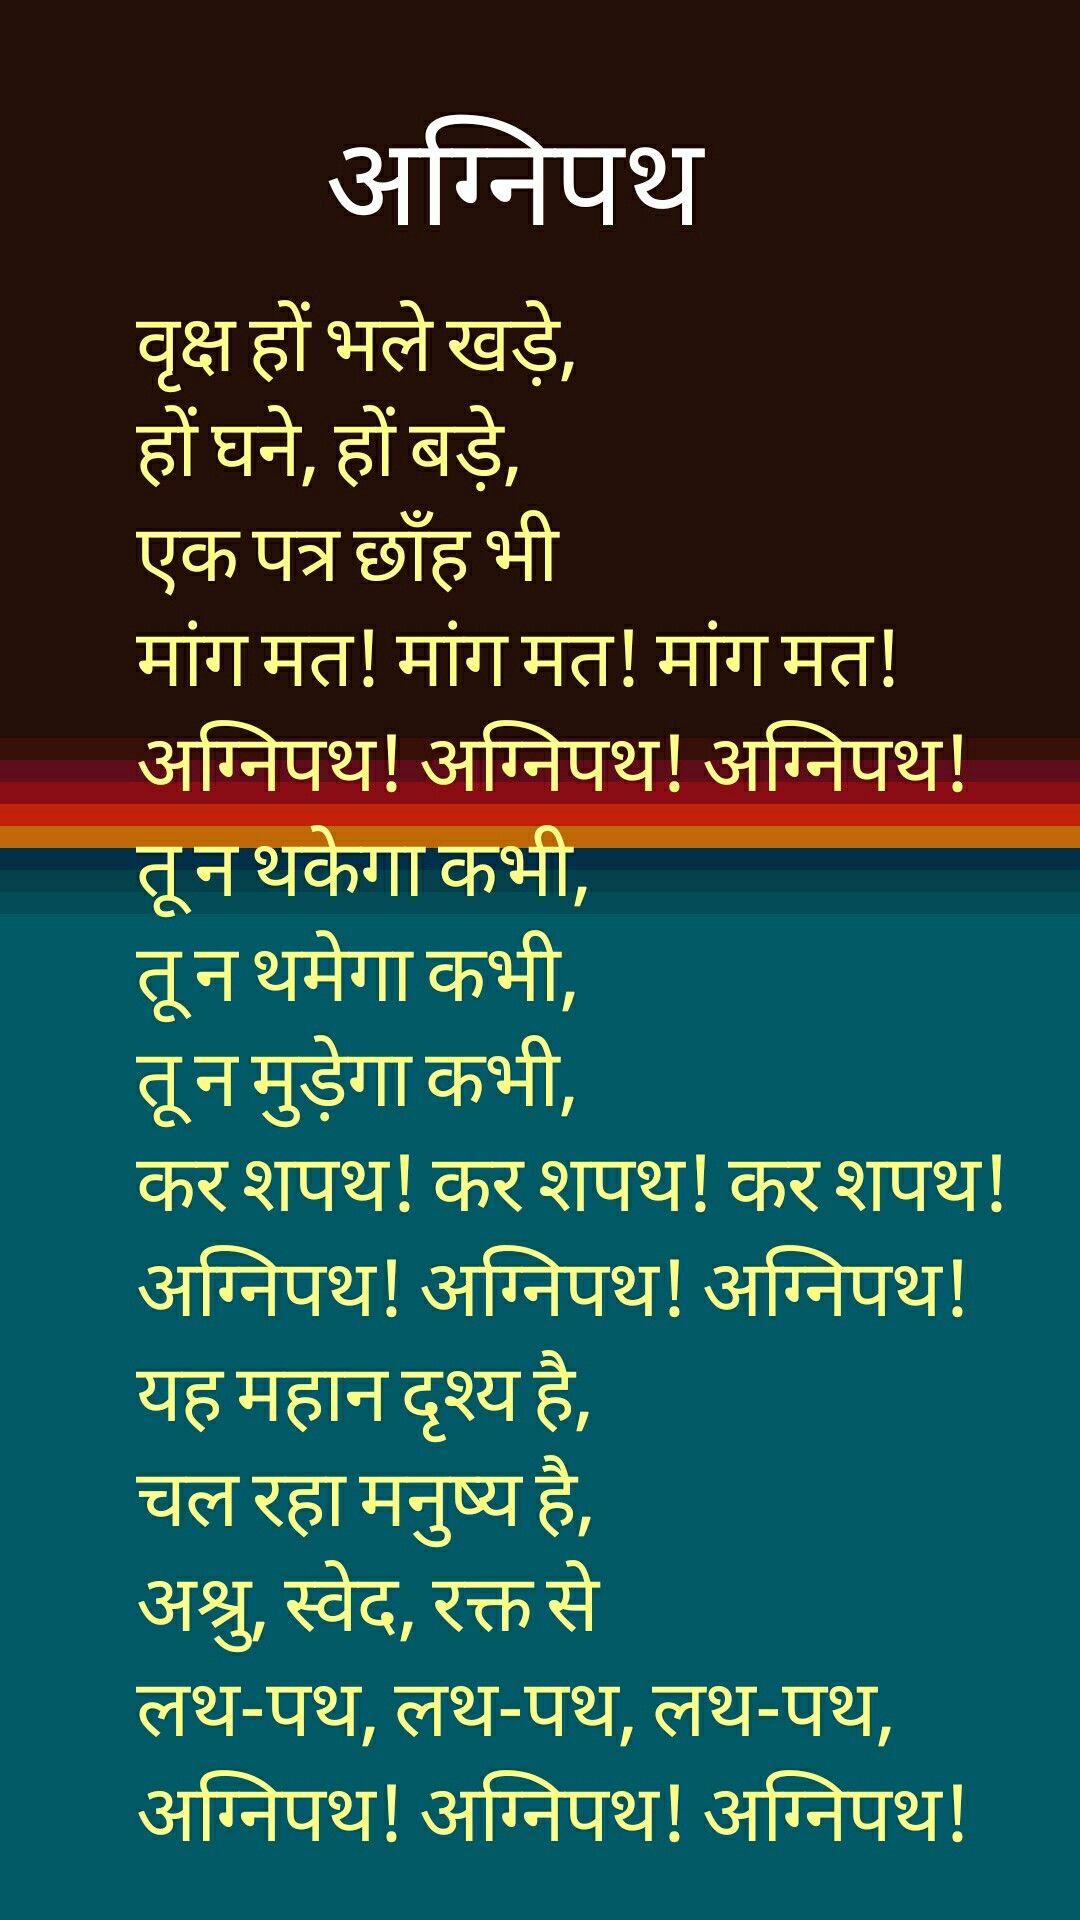 Agnipath hindi poem kavita harvivansharaybacchan